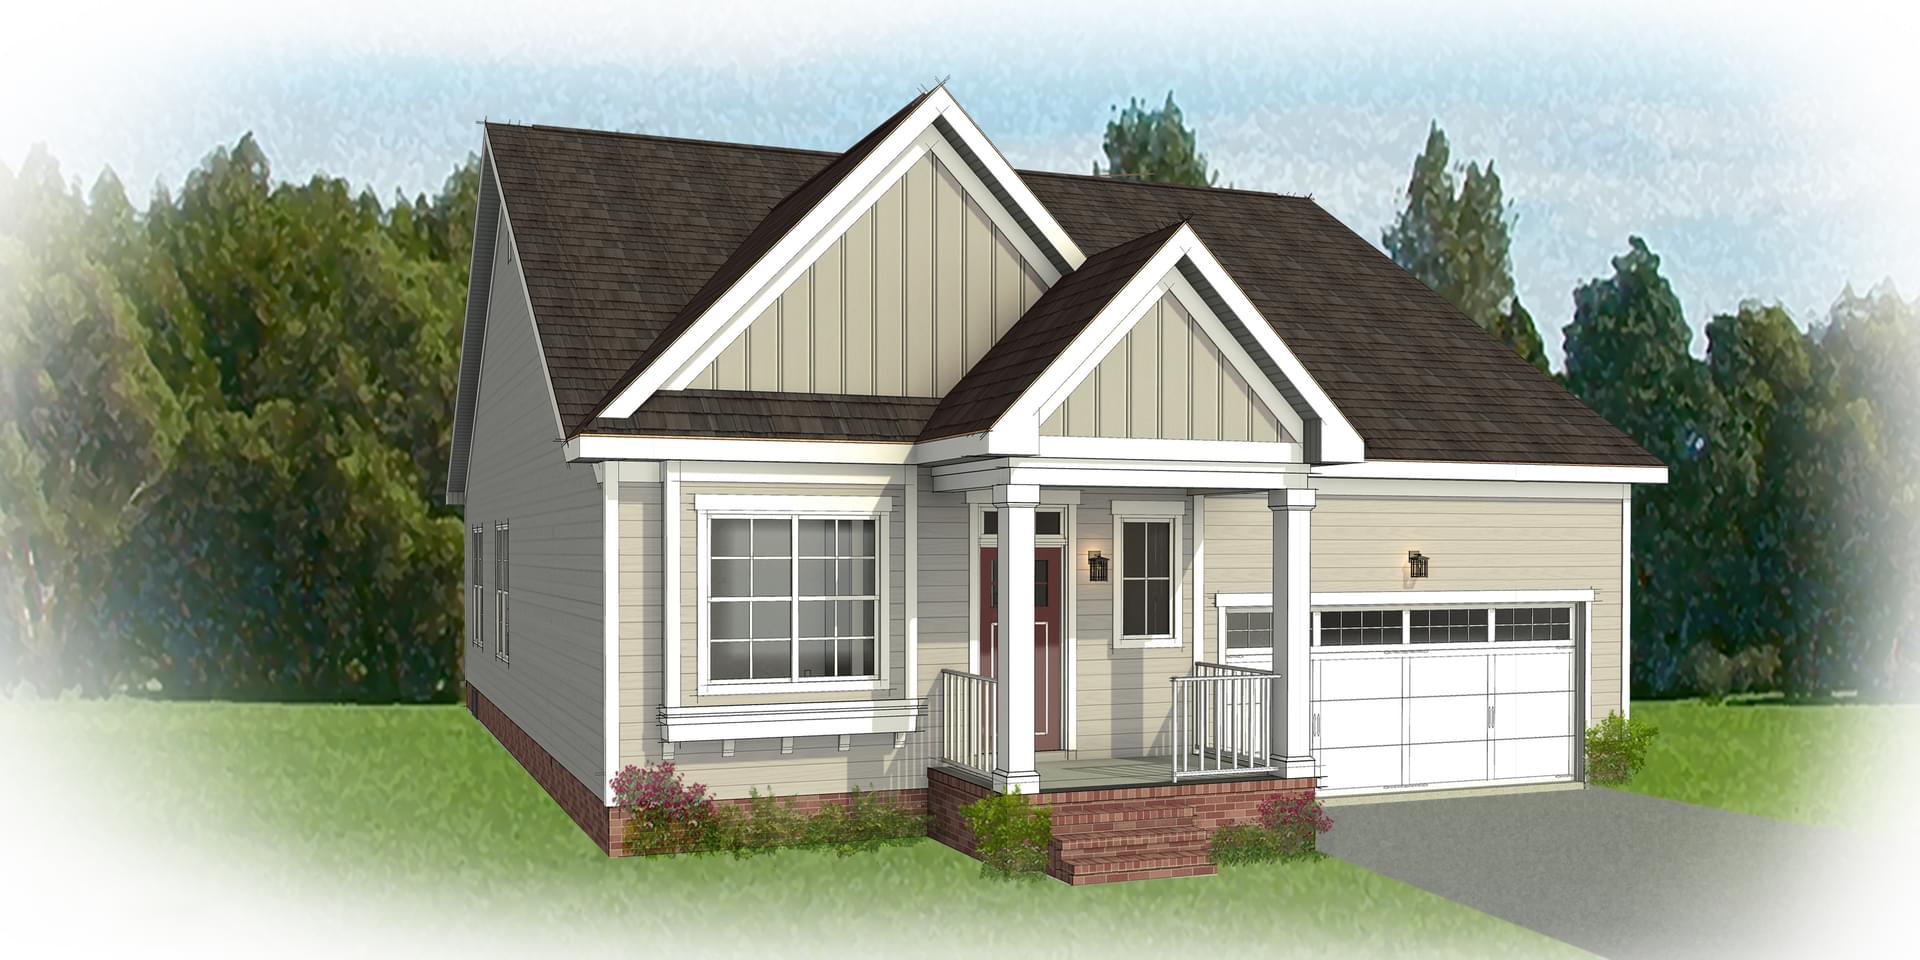 The Belmont new home in Blacksburg VA